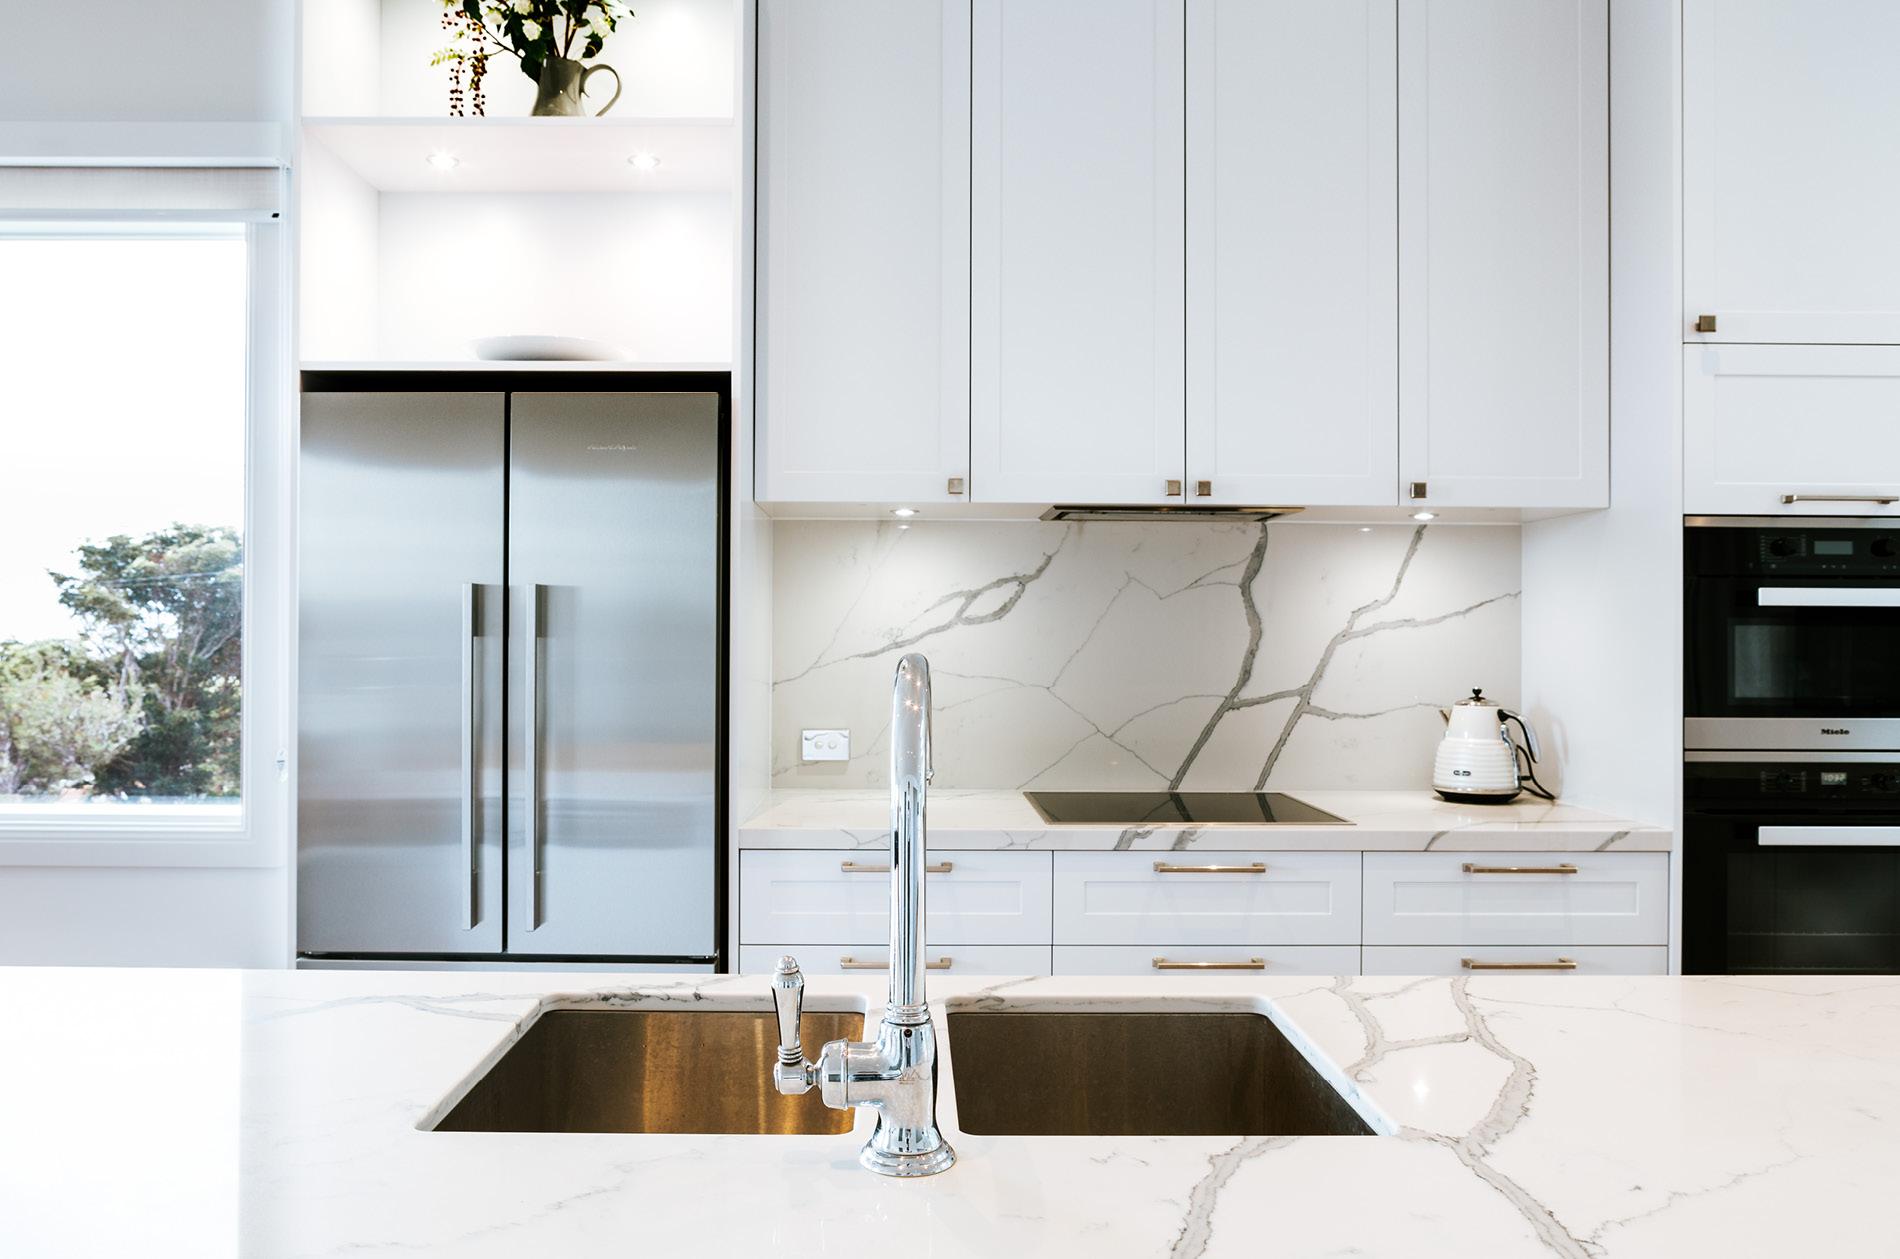 French Provincial Design Perfectly Blends In Statuario Venato Kitchen Bench